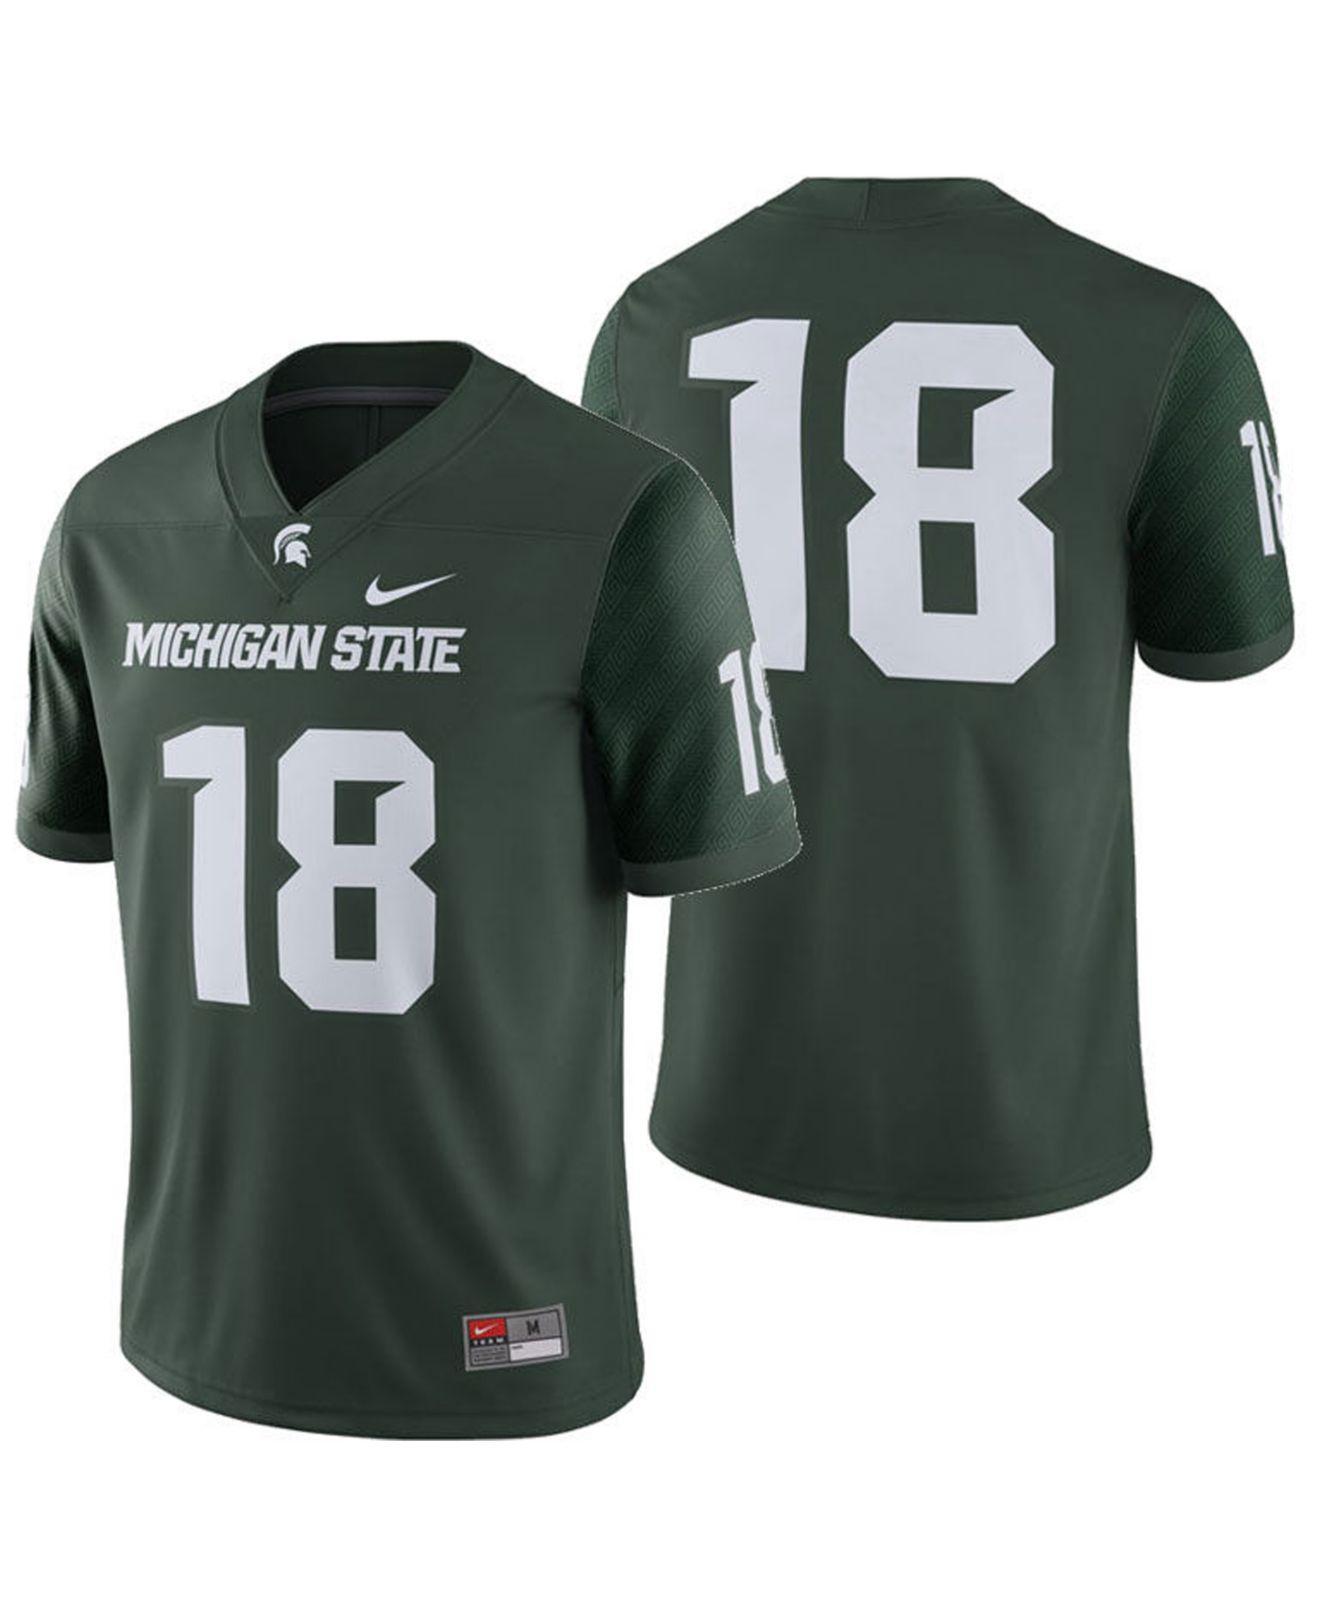 bd325e27e7a2 Lyst - Nike Michigan State Spartans Football Replica Game Jersey in ...